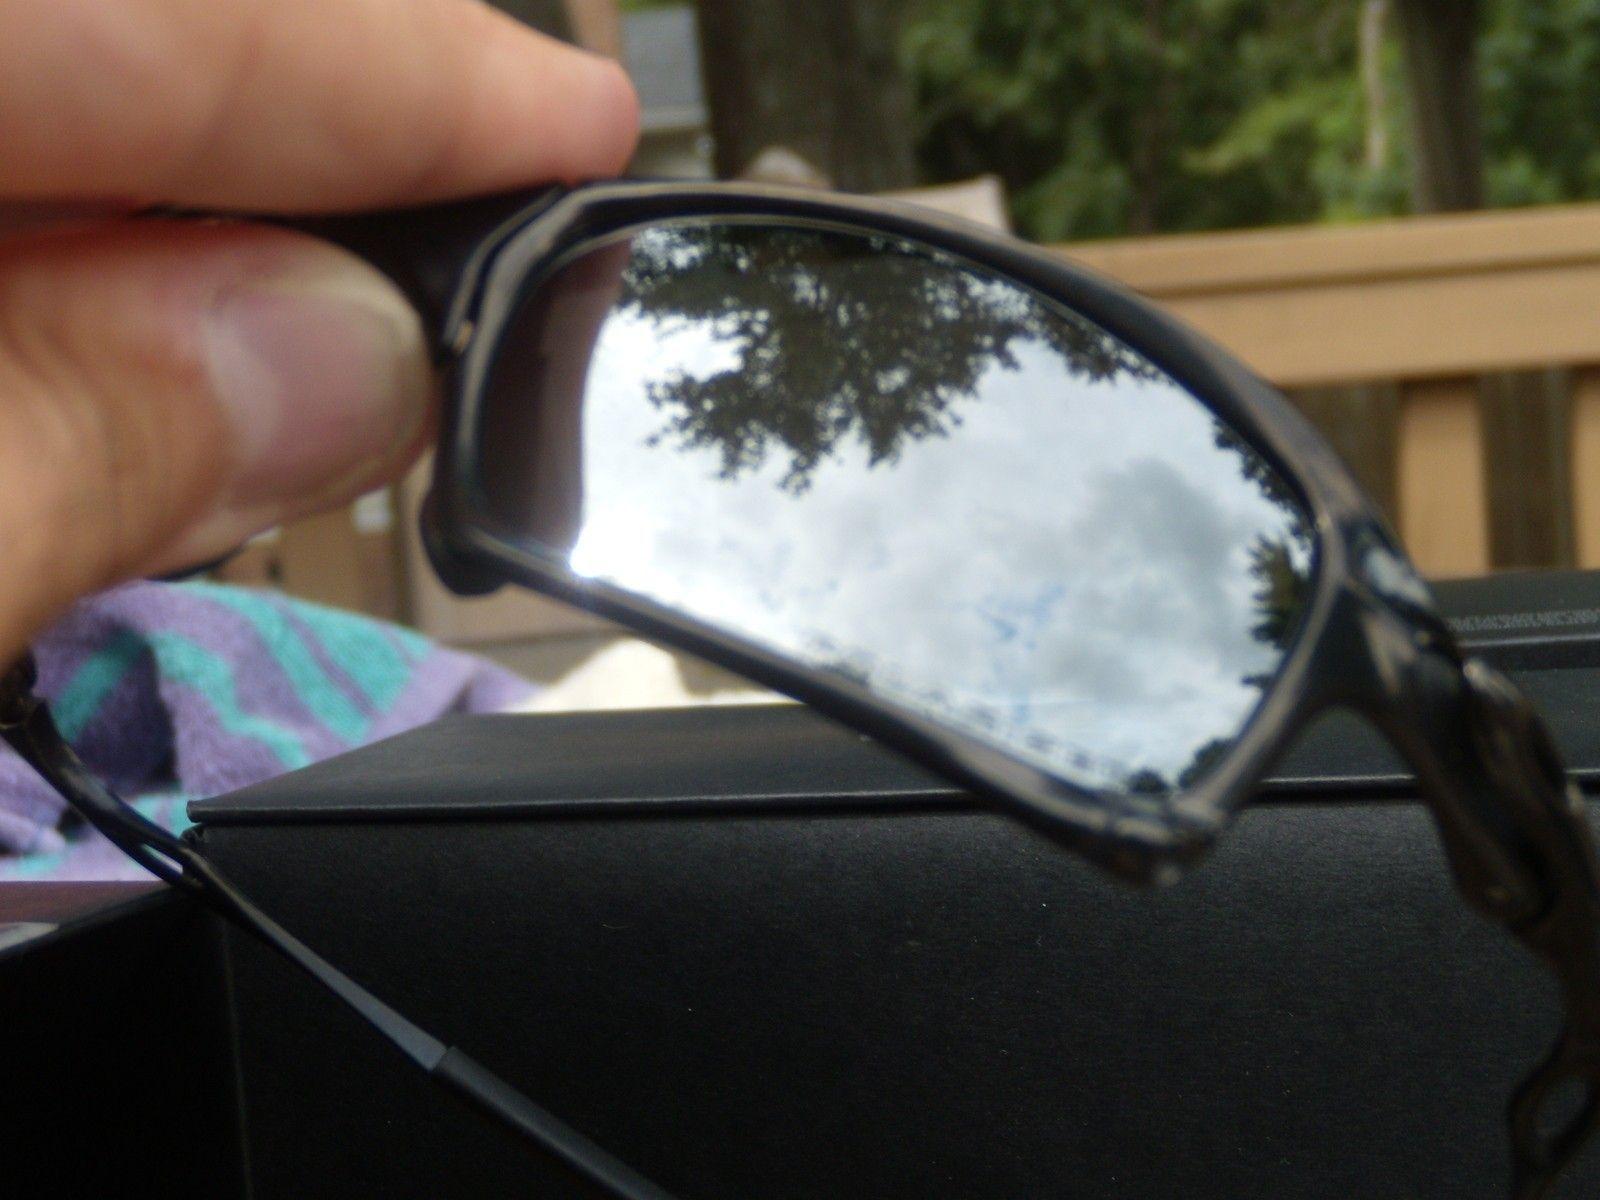 XX Squared Polished Carbon w/ Black Iridium Polarized lenses mint condition $450 obo - DSCN5998.JPG